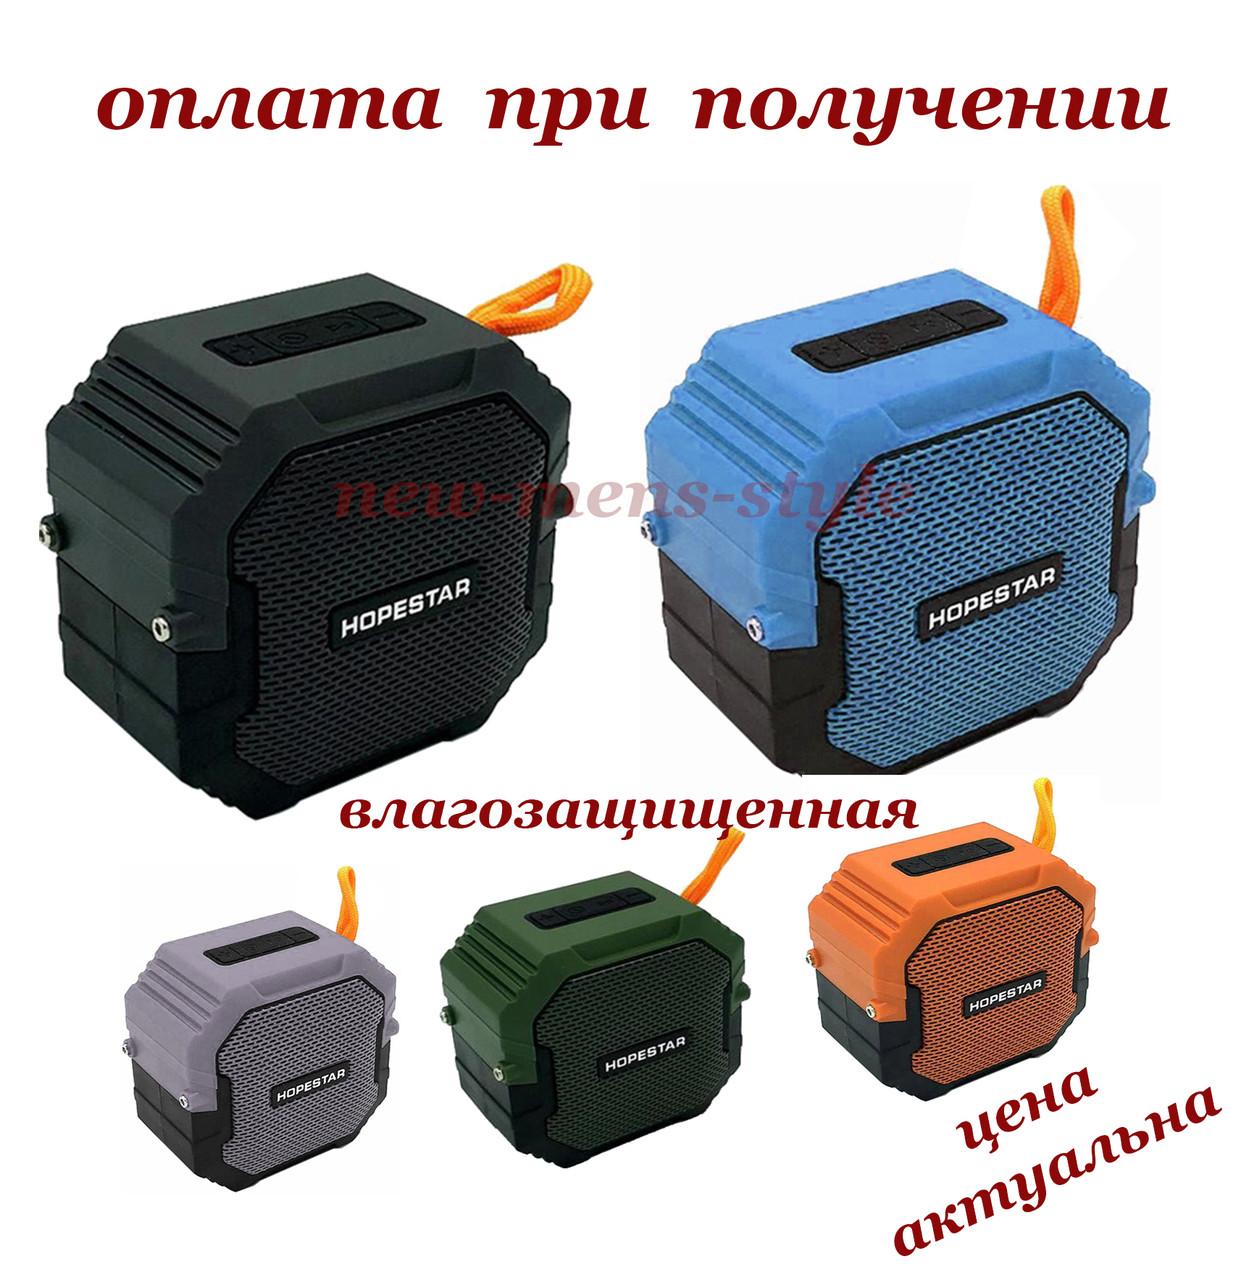 Бездротова мобільна портативна вологозахищена Bluetooth колонка радіо акустика HOPESTAR T7 ГУЧНА